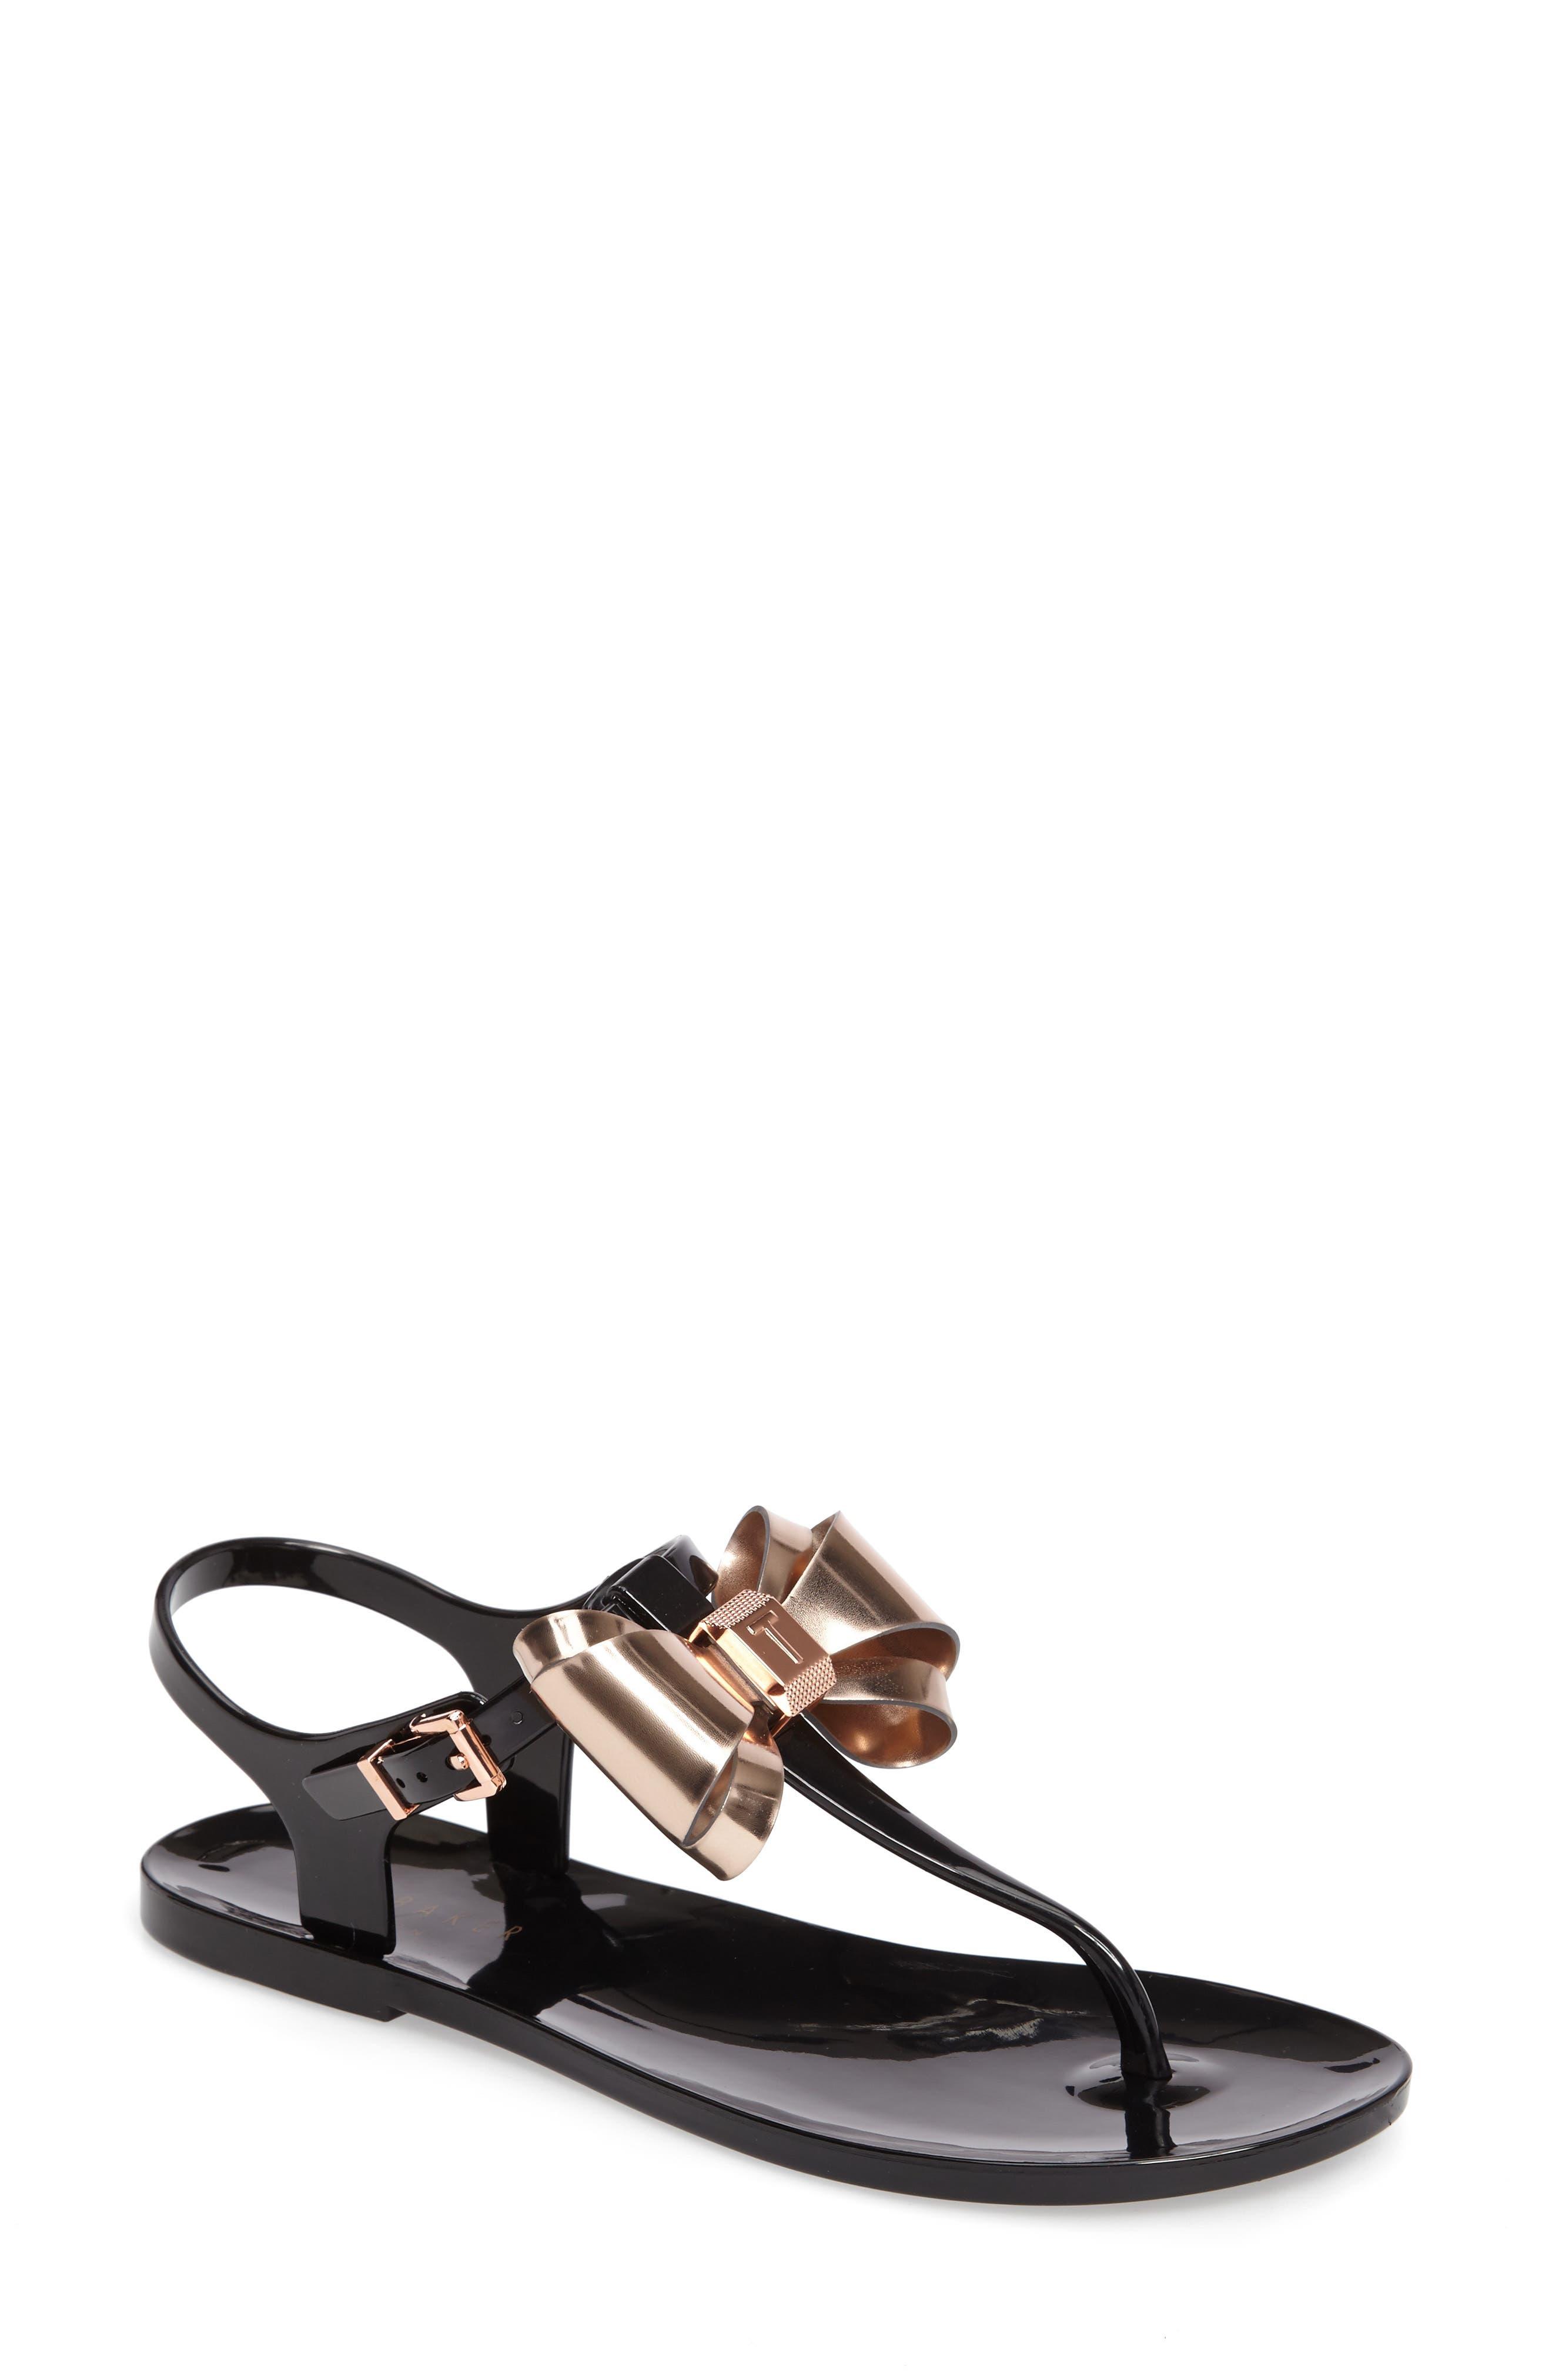 Ainda Slingback Bow Sandal,                         Main,                         color, Black/ Rose Gold